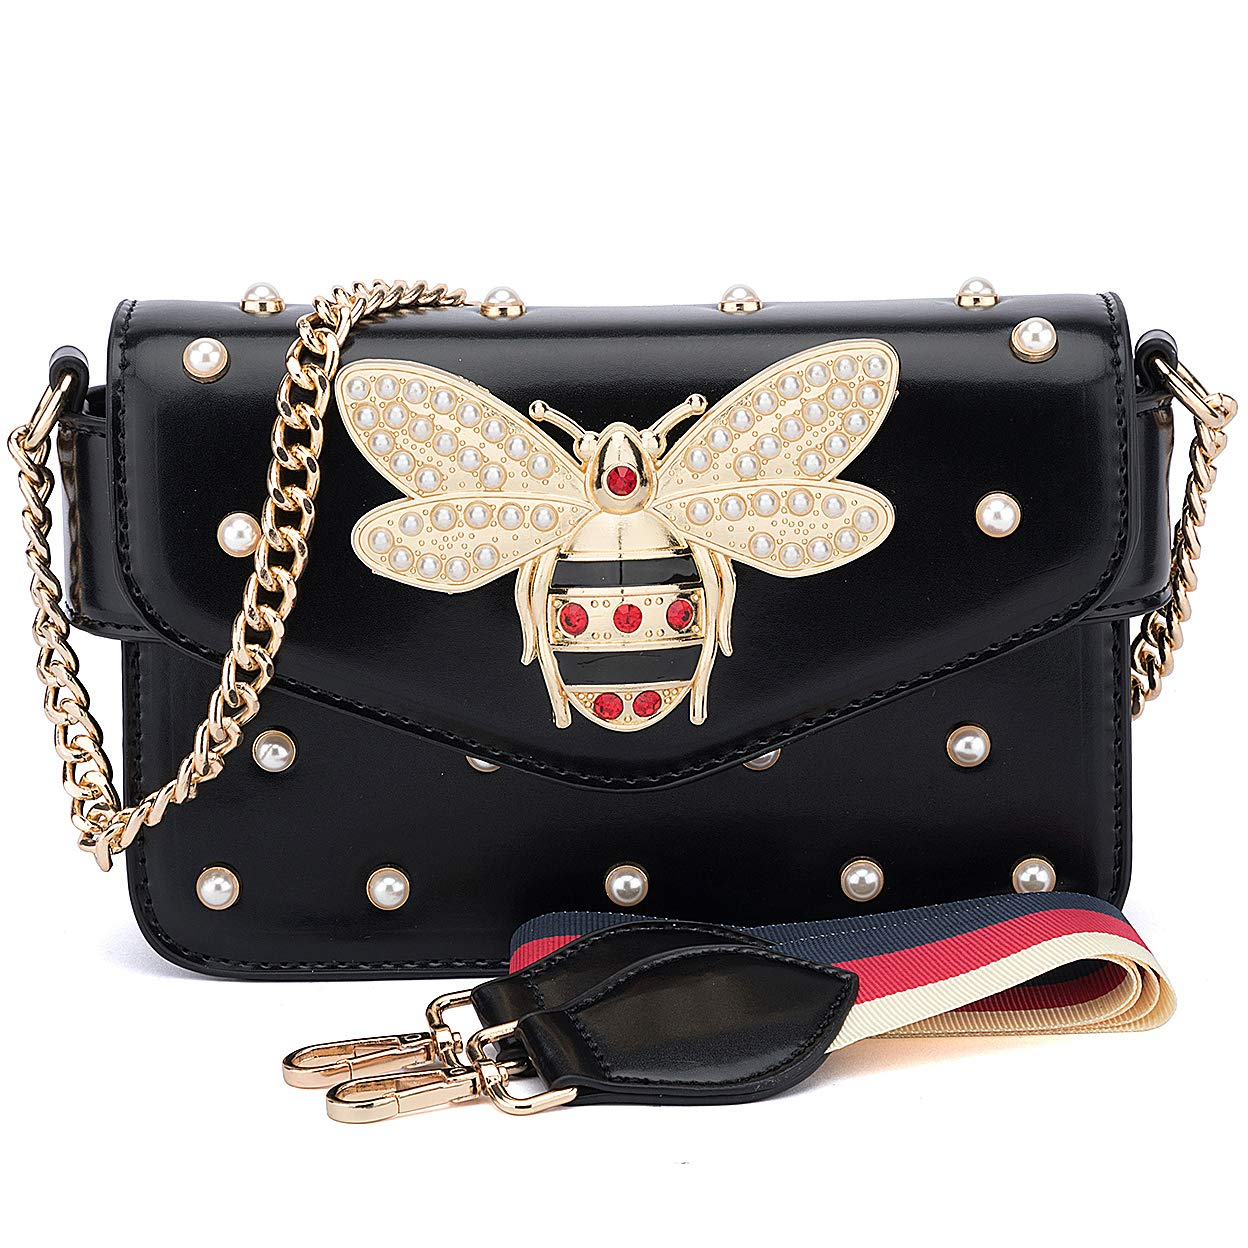 Amazon.com  BNWVC Bee Purses and Handbags for Women Fashion Shoulder  Crossbody Bags Satchel  Shoes aadad43e3f364